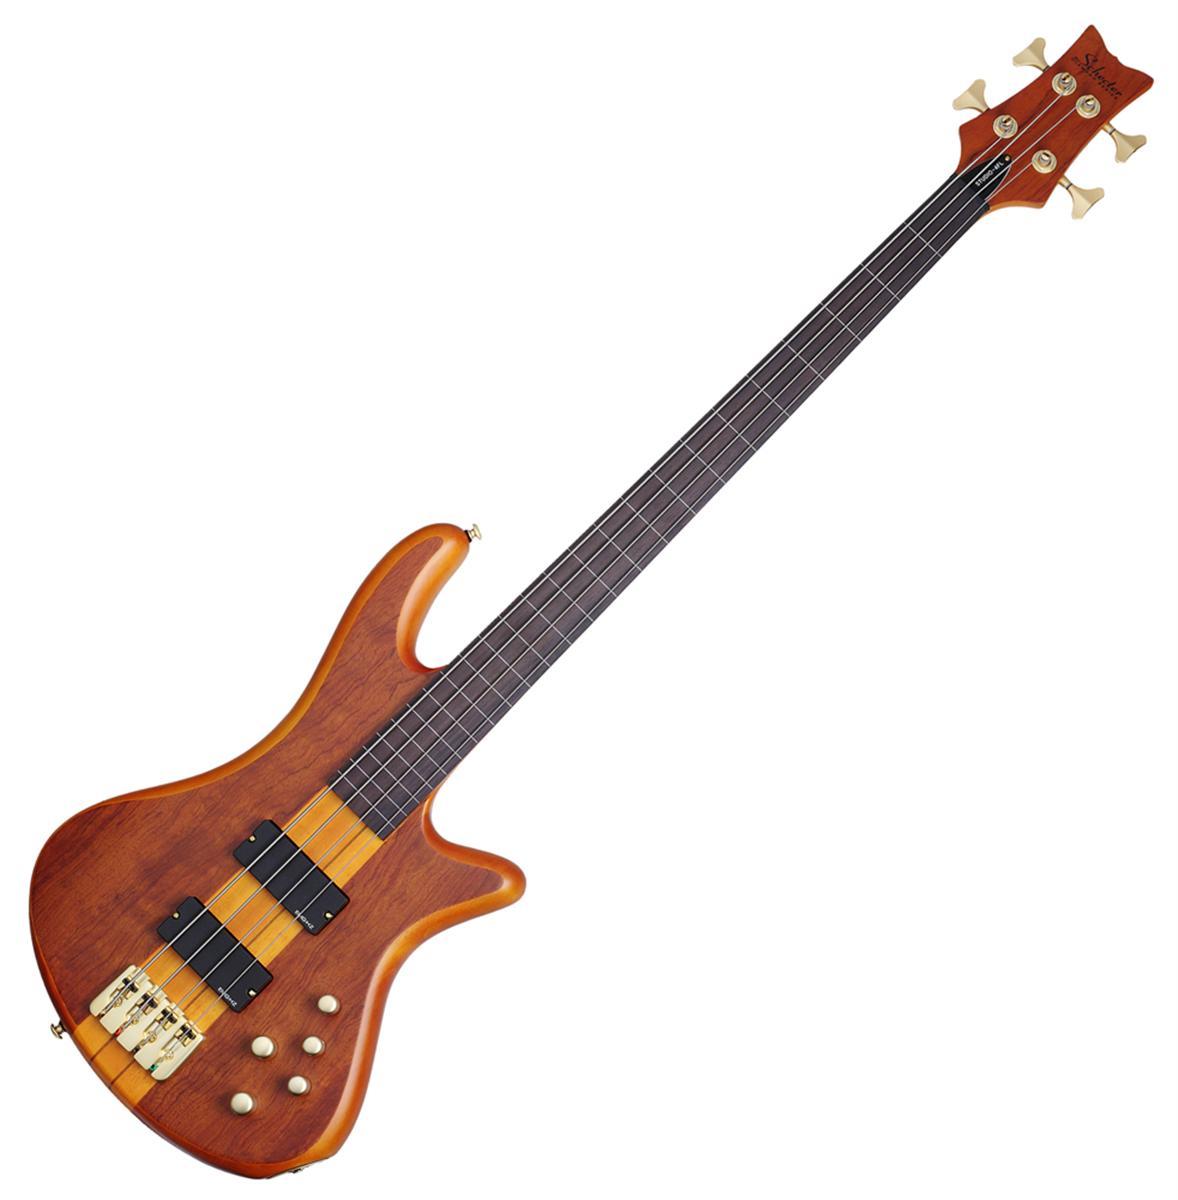 Guitar Bass 17371 Hd Wallpapers in Music   Imagescicom 1178x1200